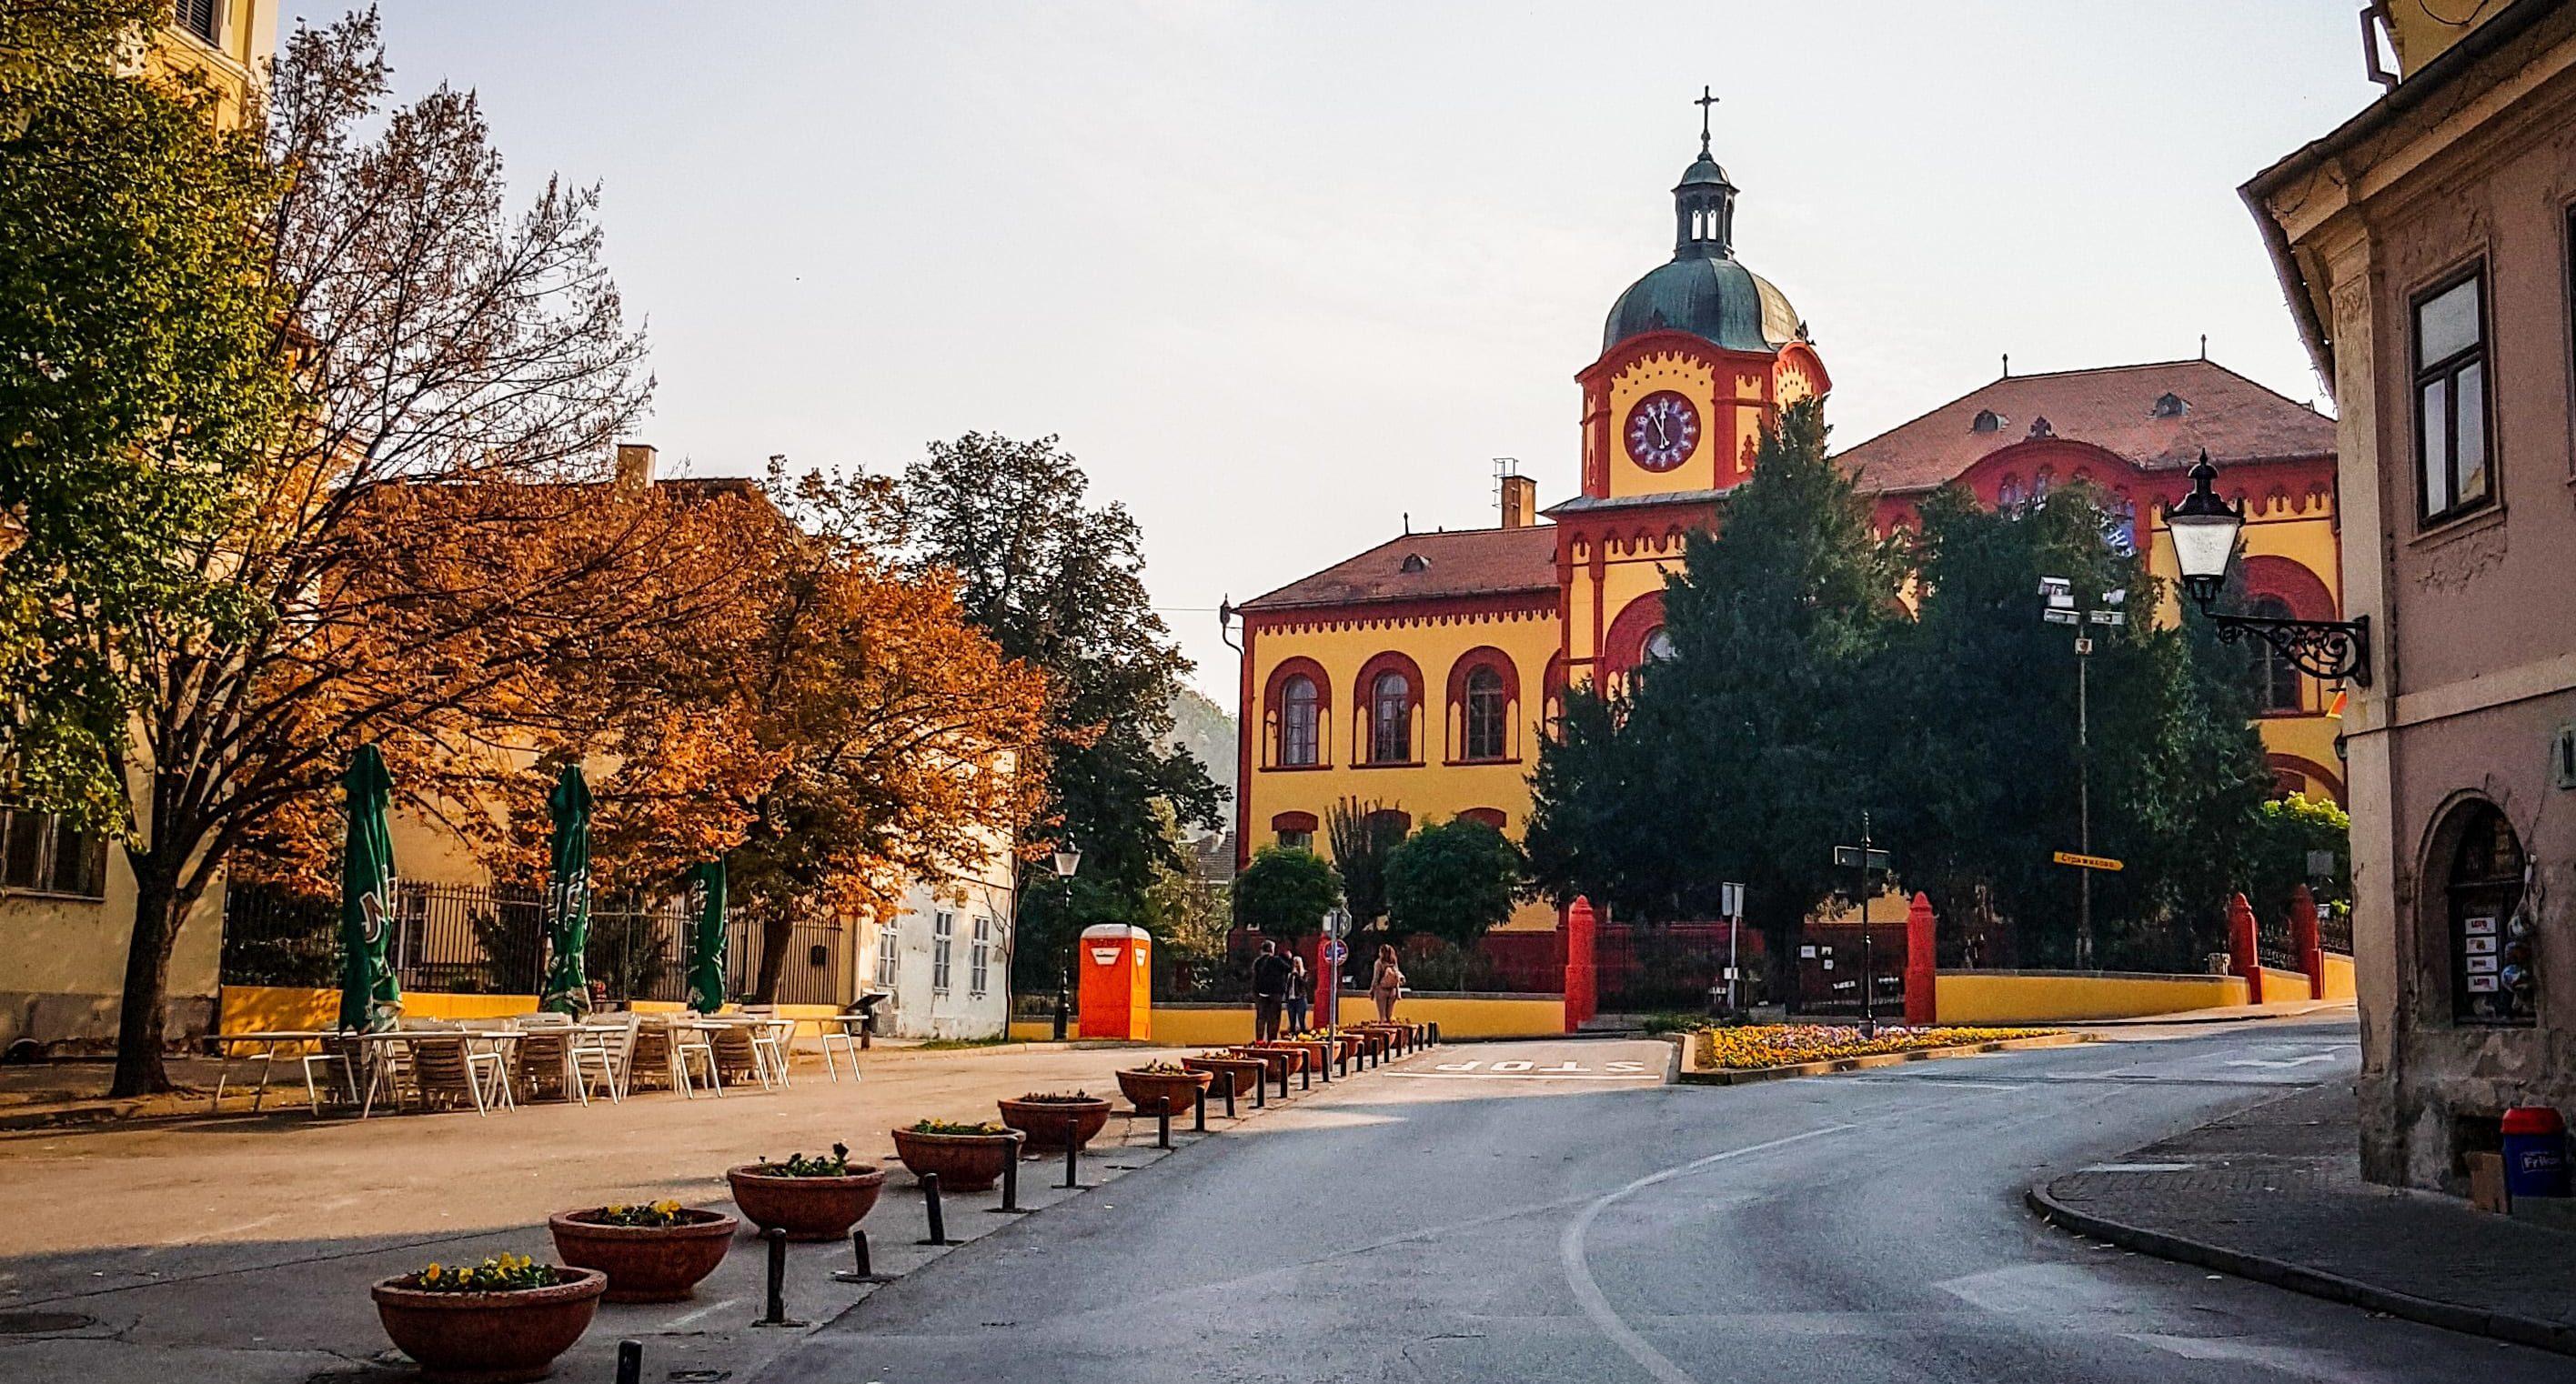 Сремски-Карловци (Sremski Karlovci)